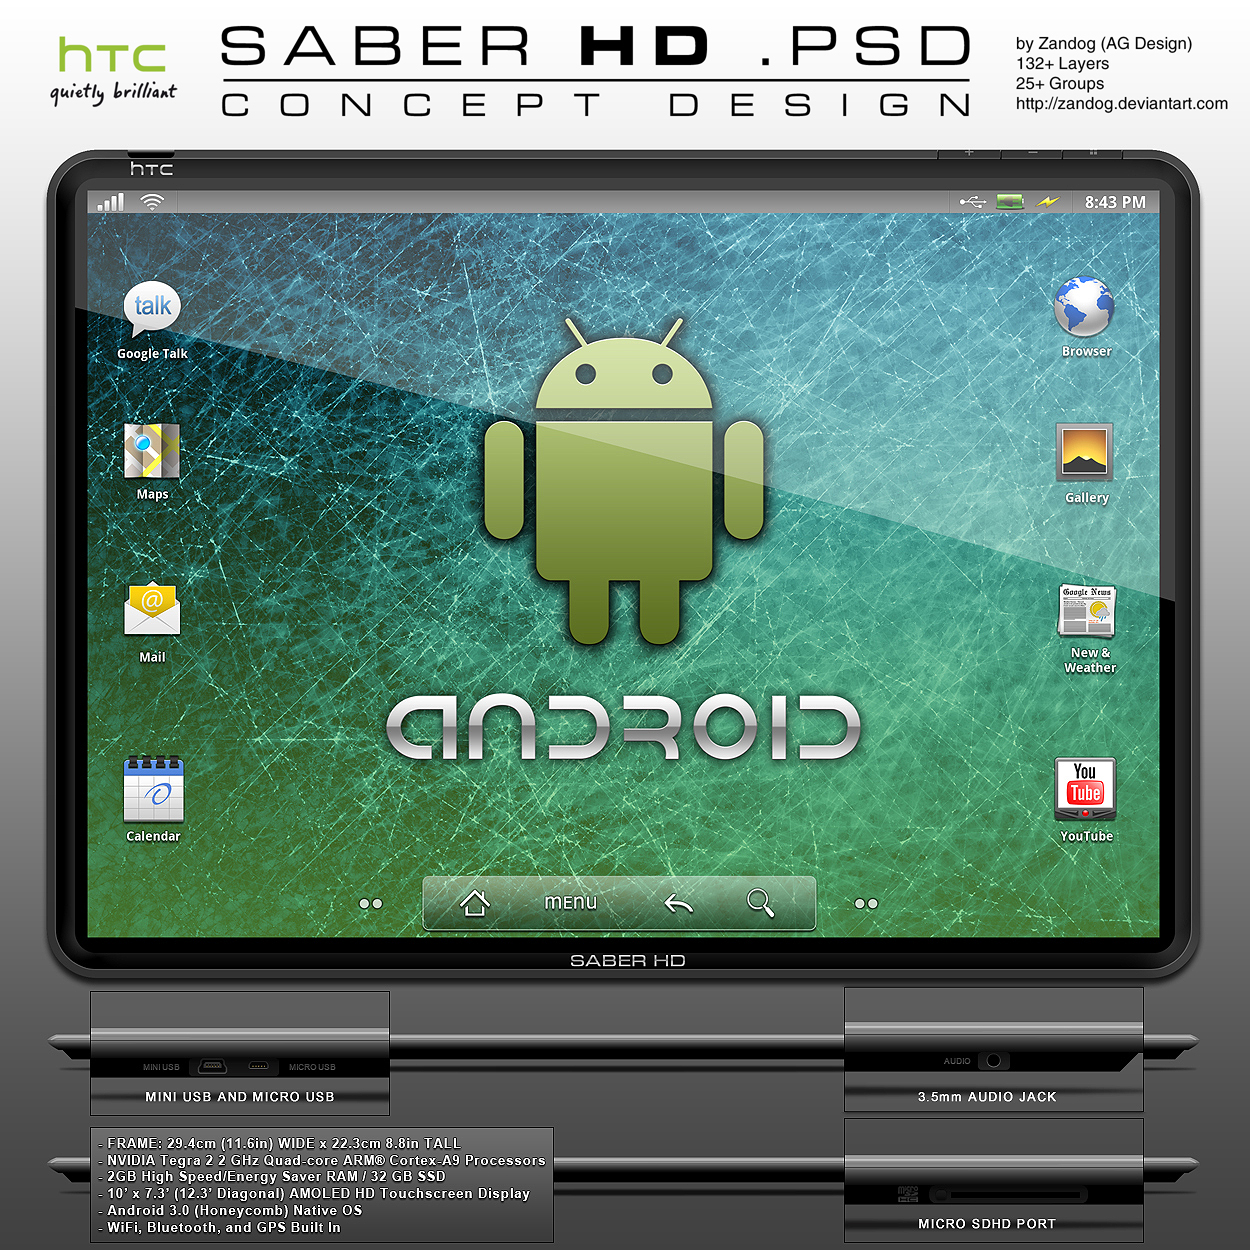 HTC SABER HD Tablet .PSD